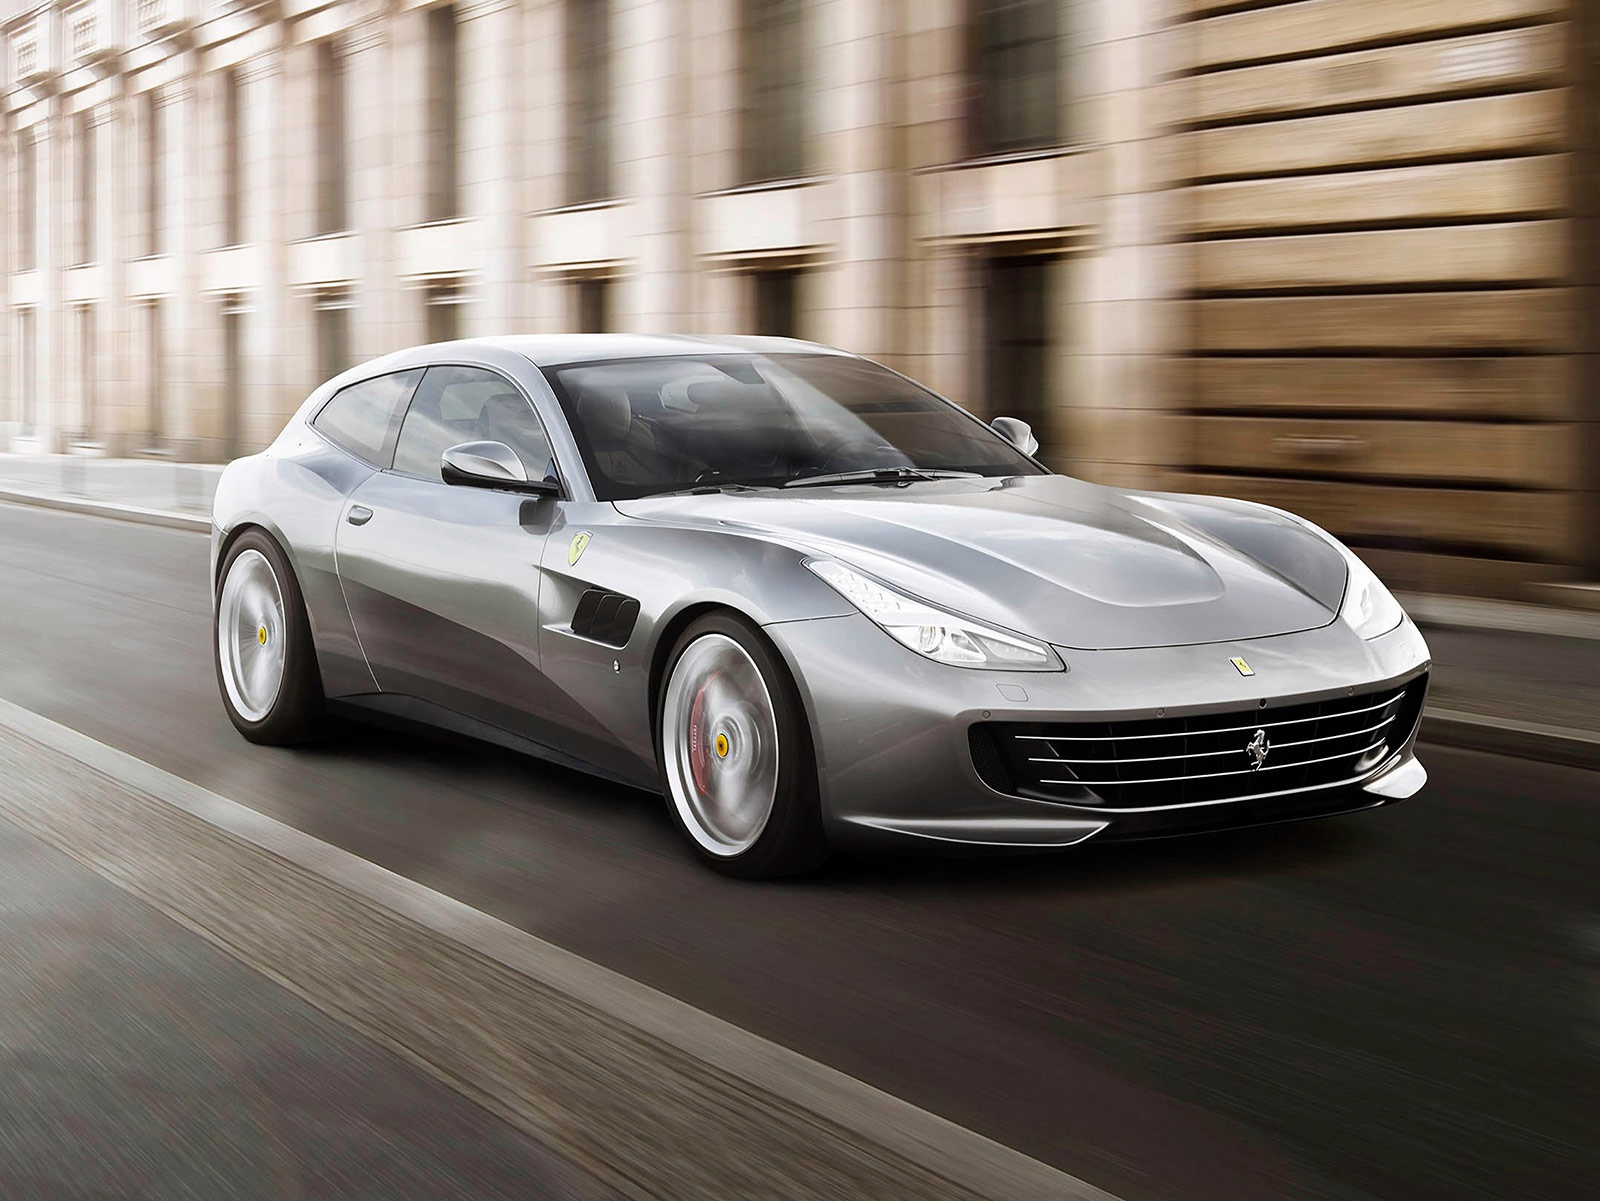 New 2019 Ferrari GTC4LUSSO T  For Sale In Greenwich, CT 232_p3